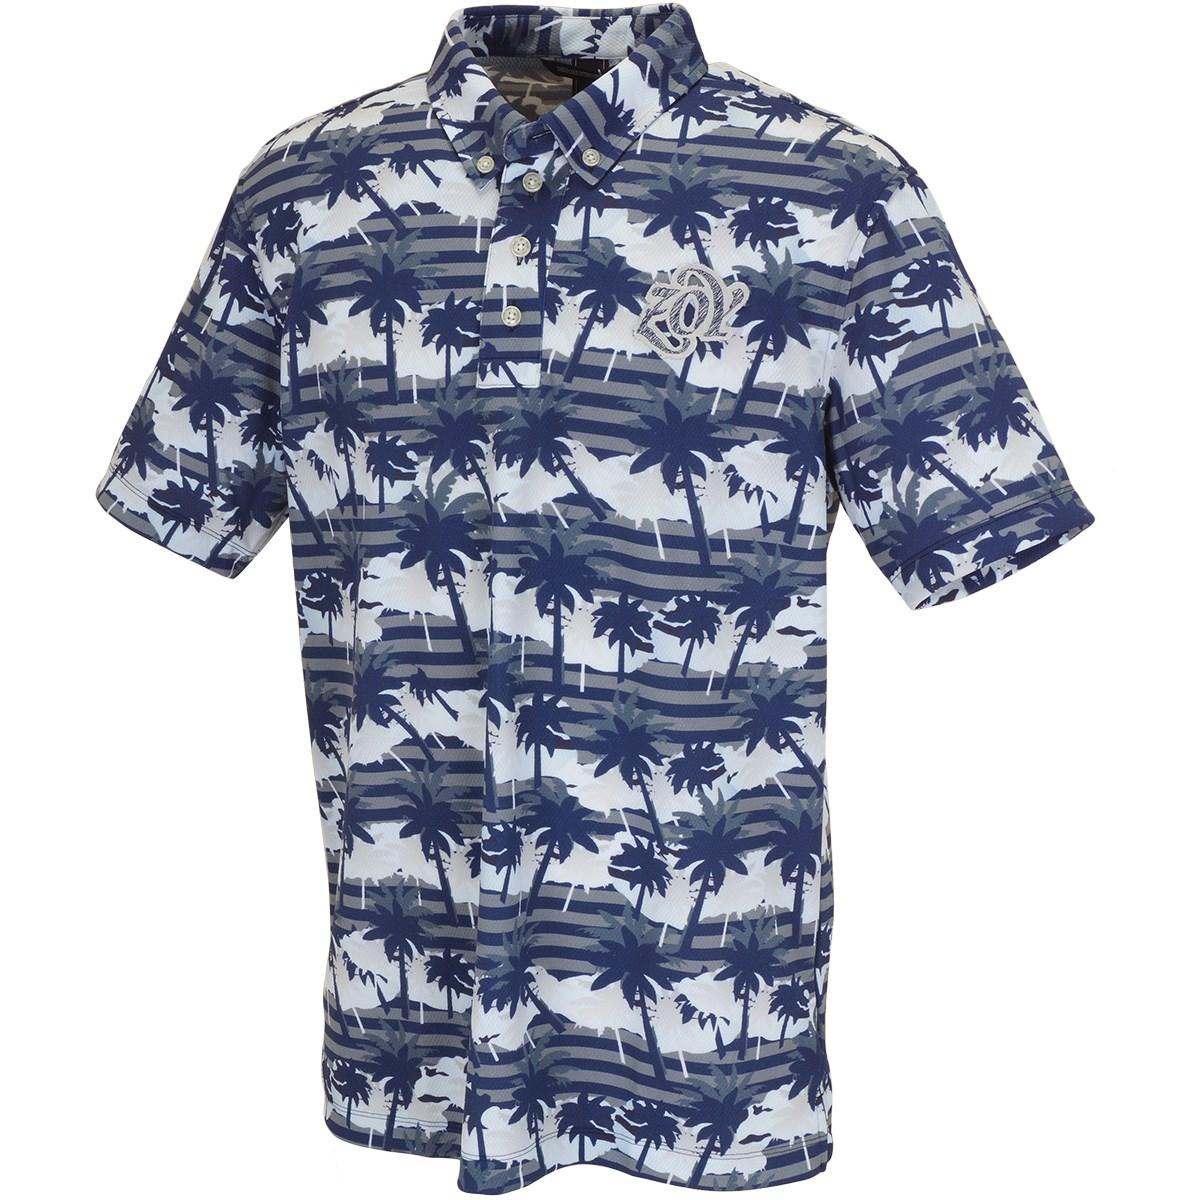 ZOY パームツリープリント 半袖ポロシャツ